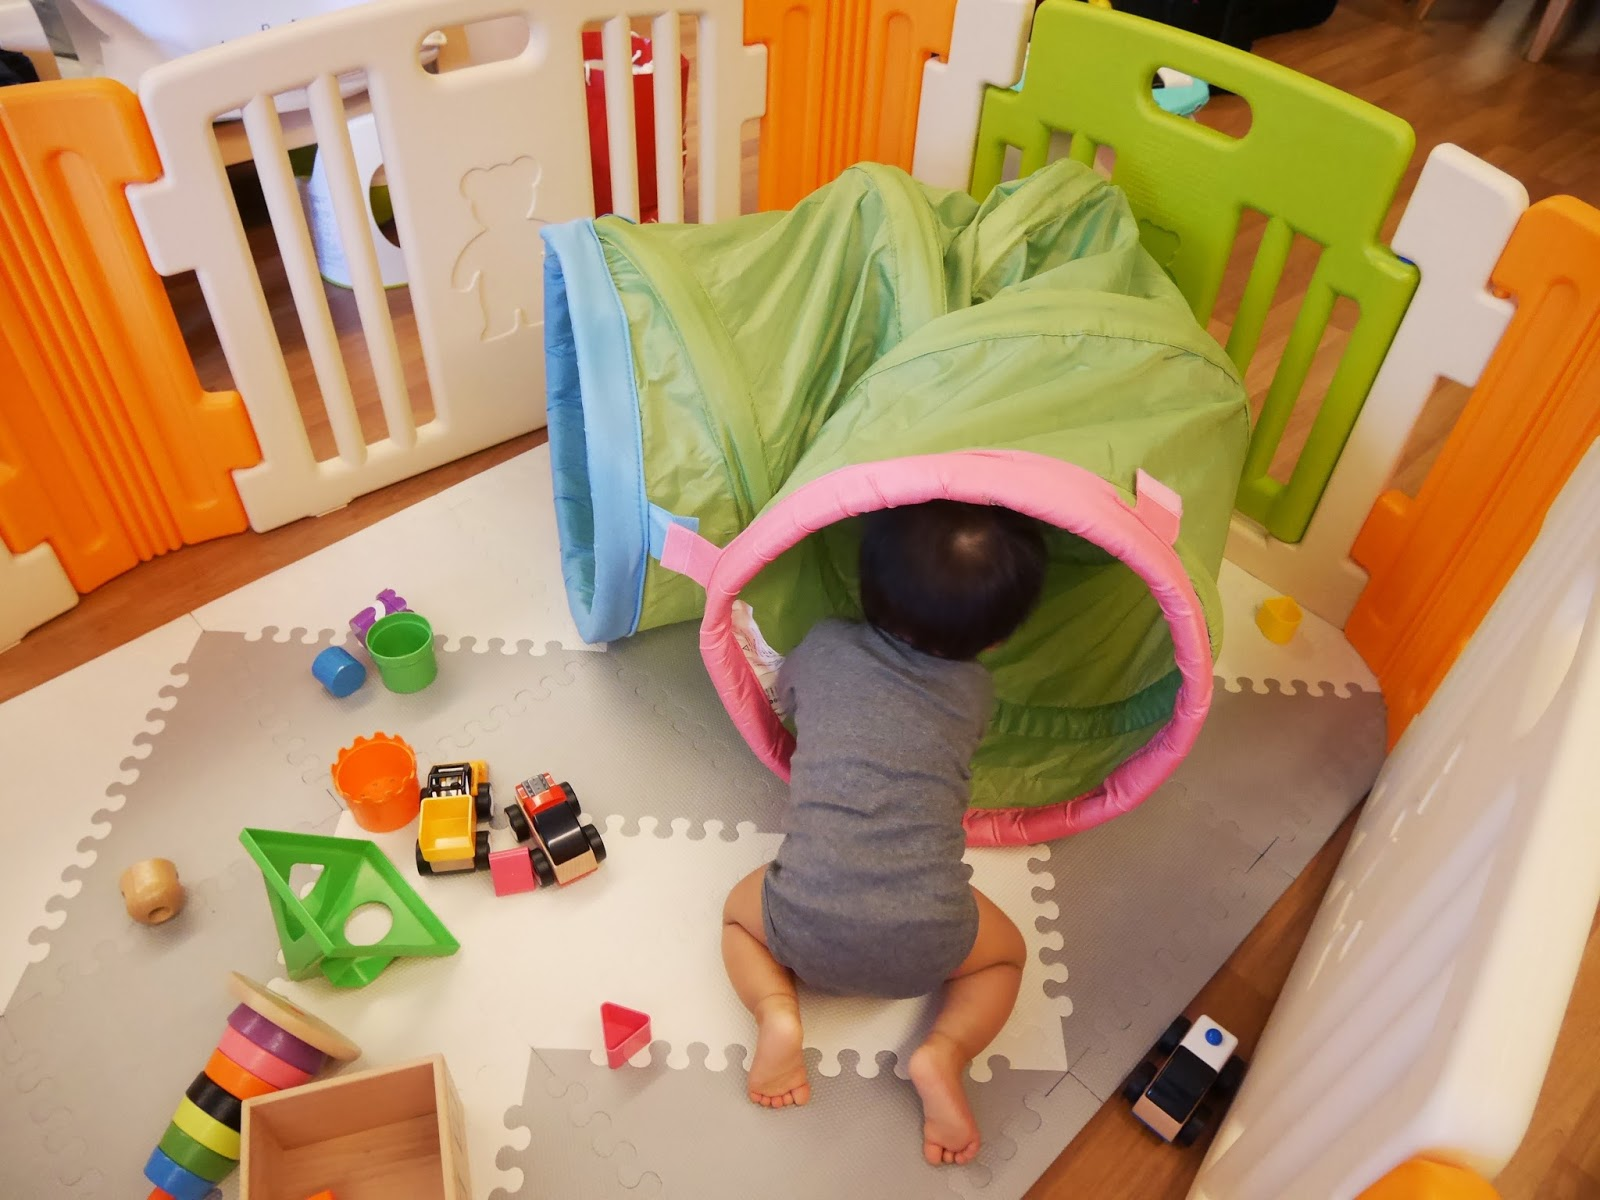 kruiptunnel ikea ikea spielzelt plus tunnel in wedemark with kruiptunnel ikea petit tunnel de. Black Bedroom Furniture Sets. Home Design Ideas